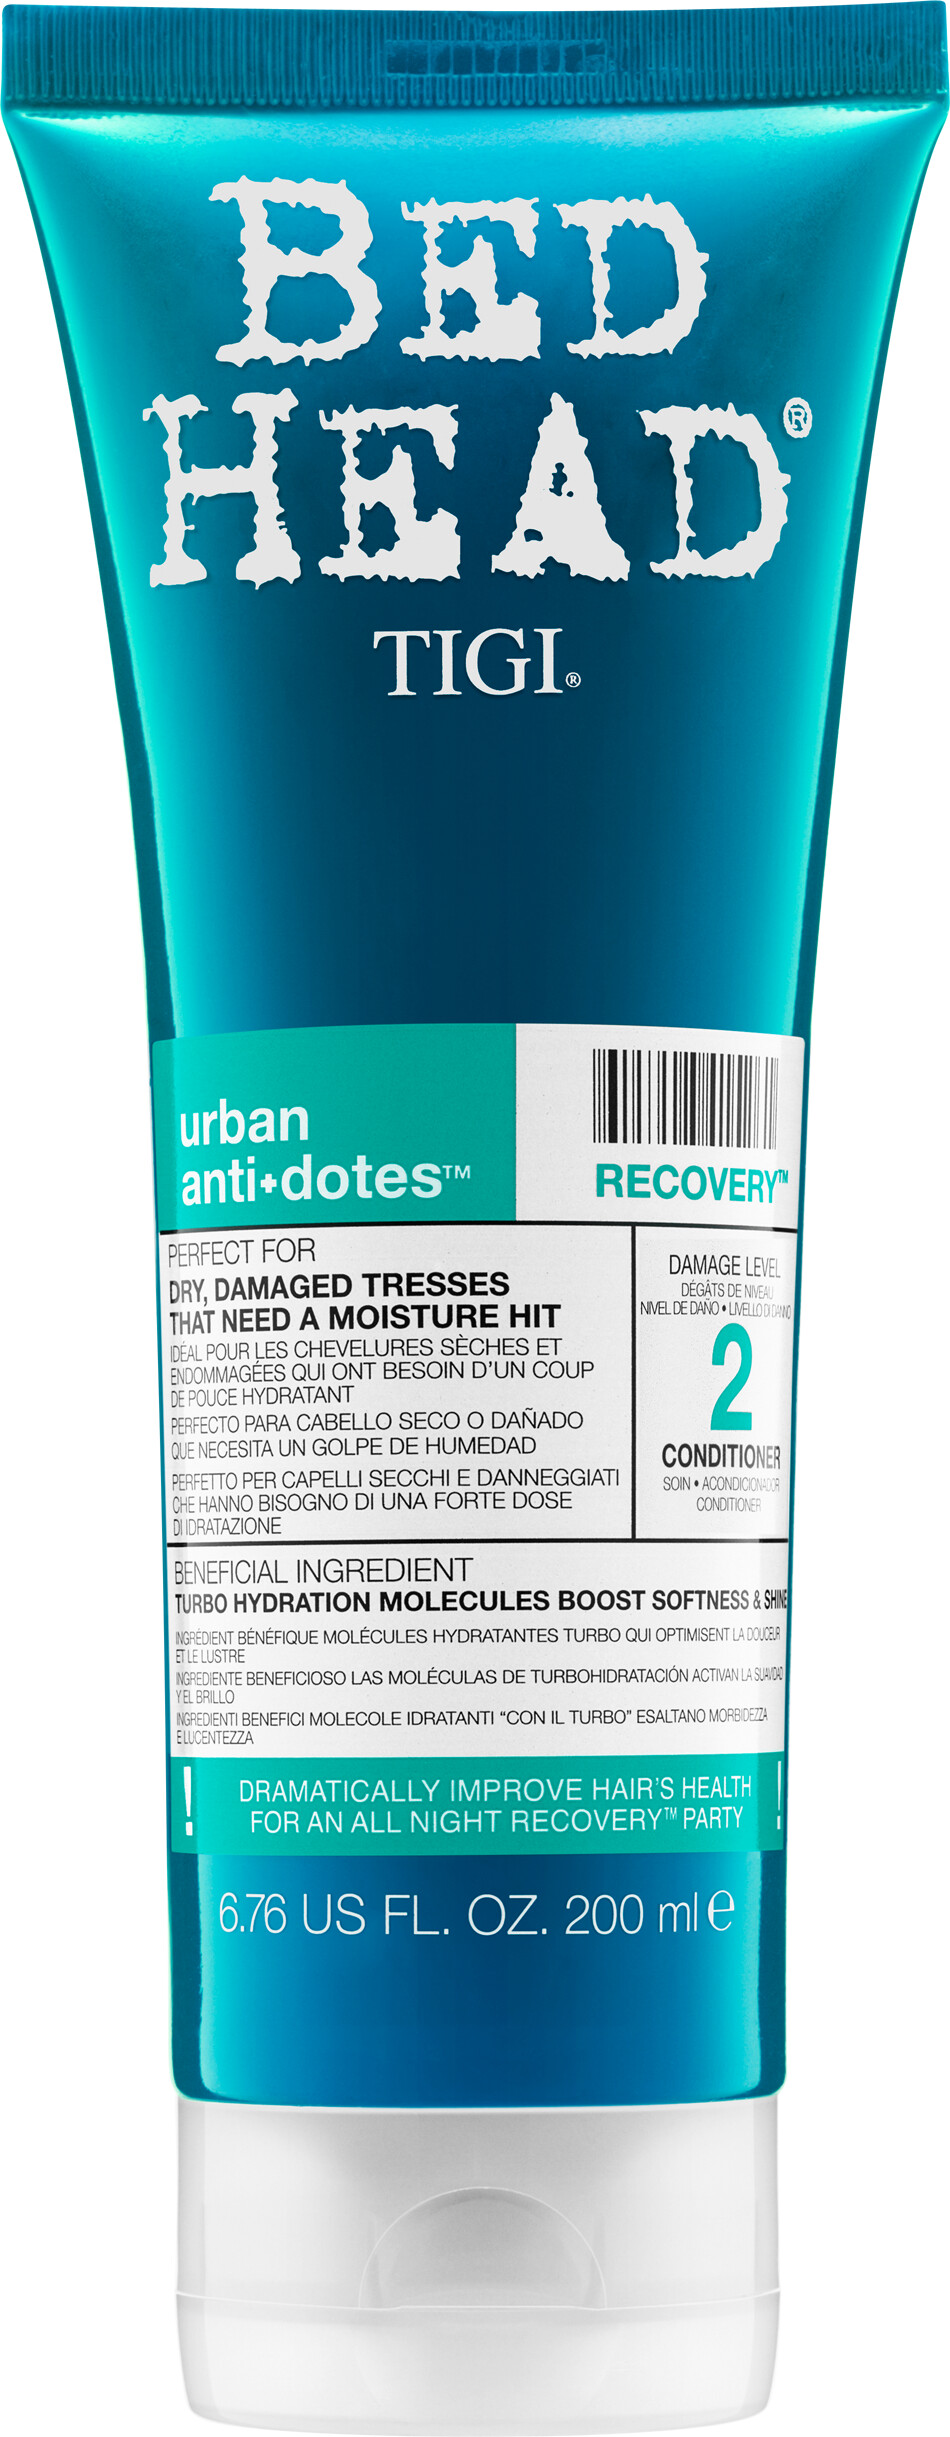 TIGI Bed Head Urban Antidotes 2 Recovery Conditioner 200ml